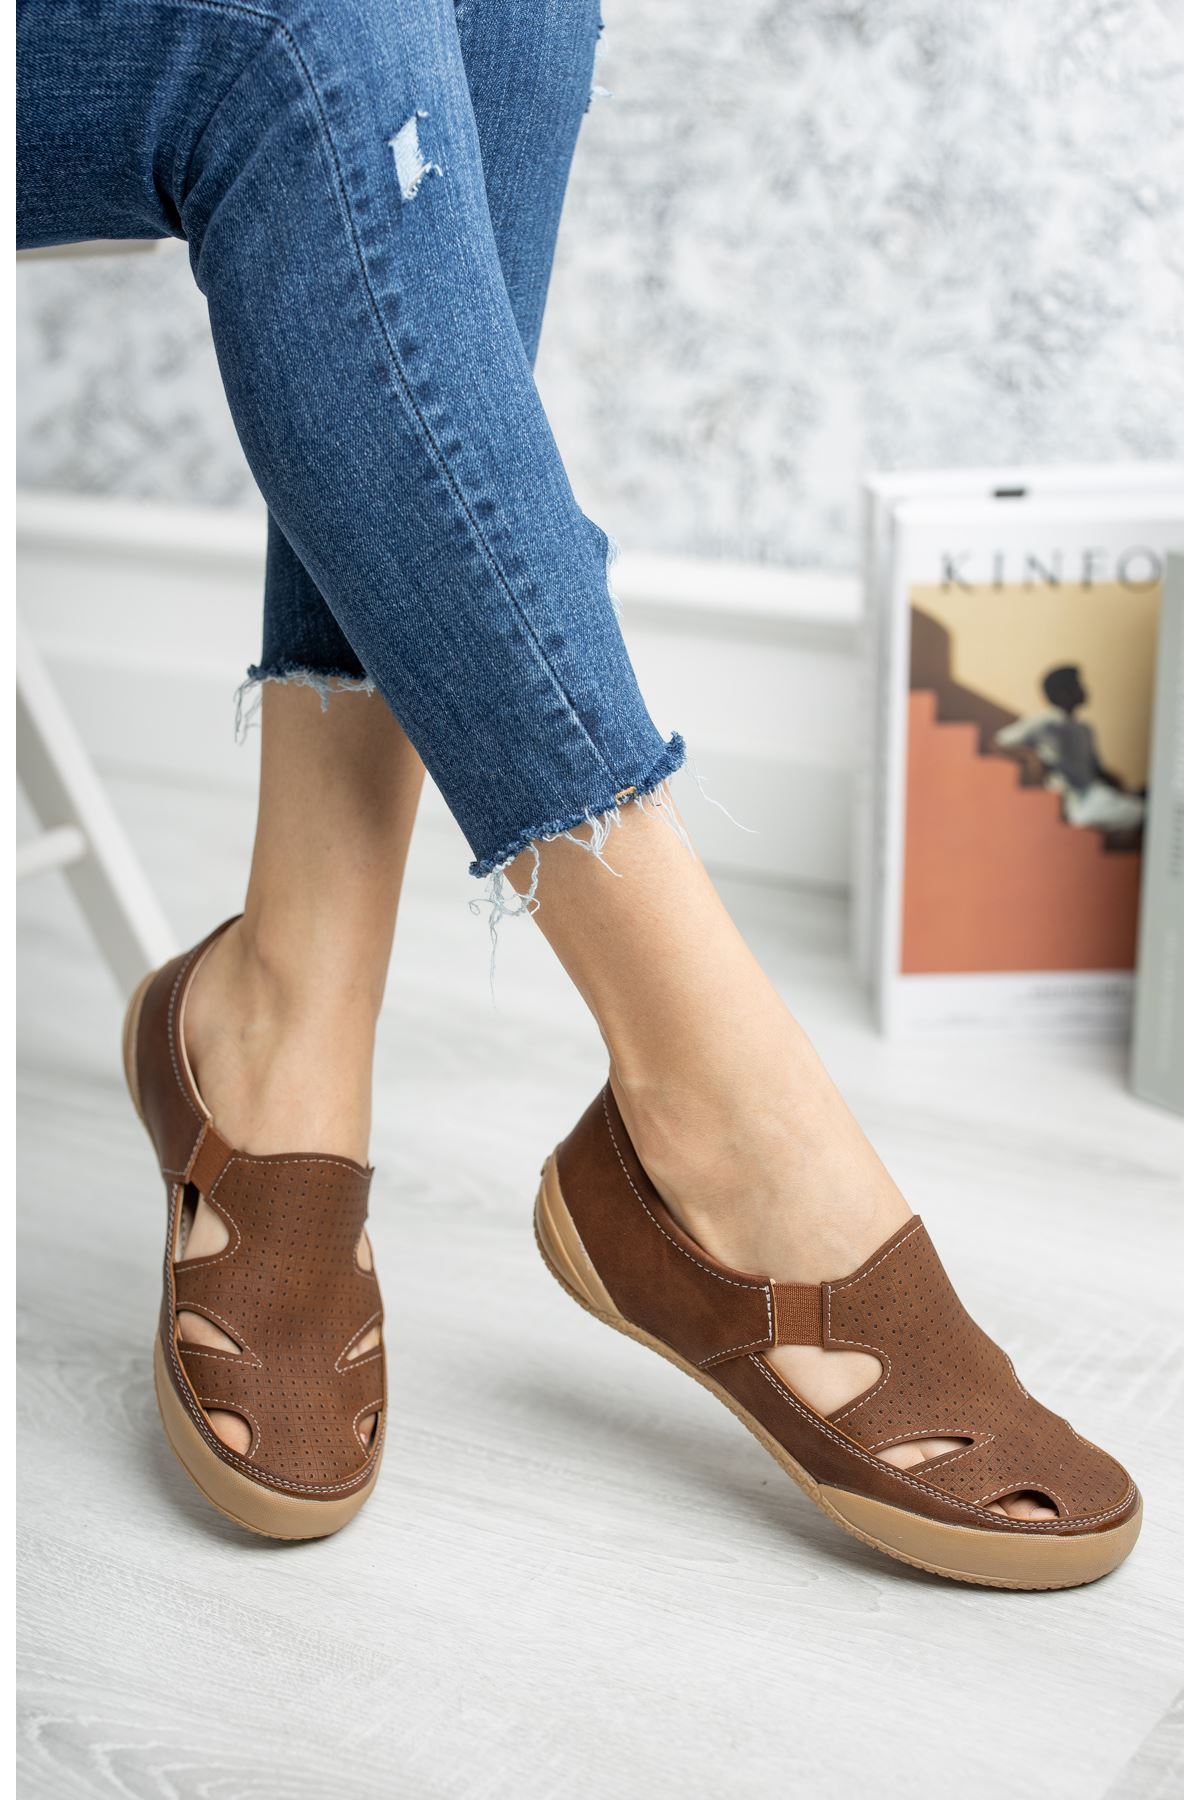 Ortapedik Pedli Lastikli Taba Ayakkabı